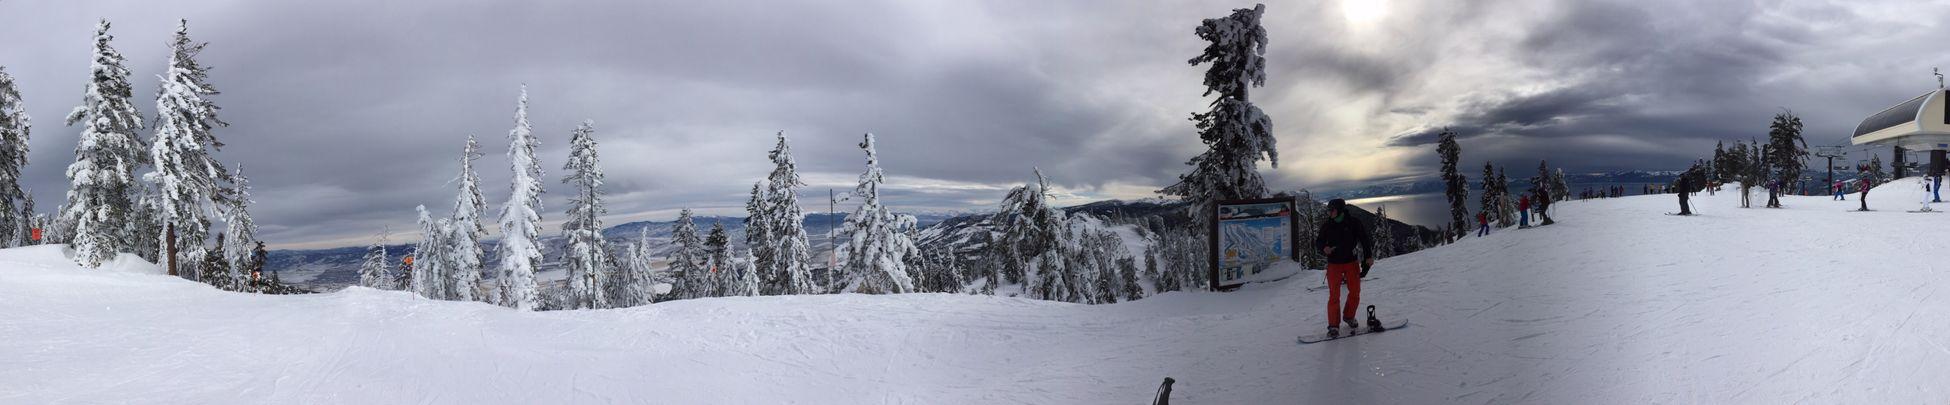 My Winter Favorites Panorama Panoramic Photography Traveling North Lake Tahoe Ski Trip Skiing Lake Tahoe It's Cold Outside